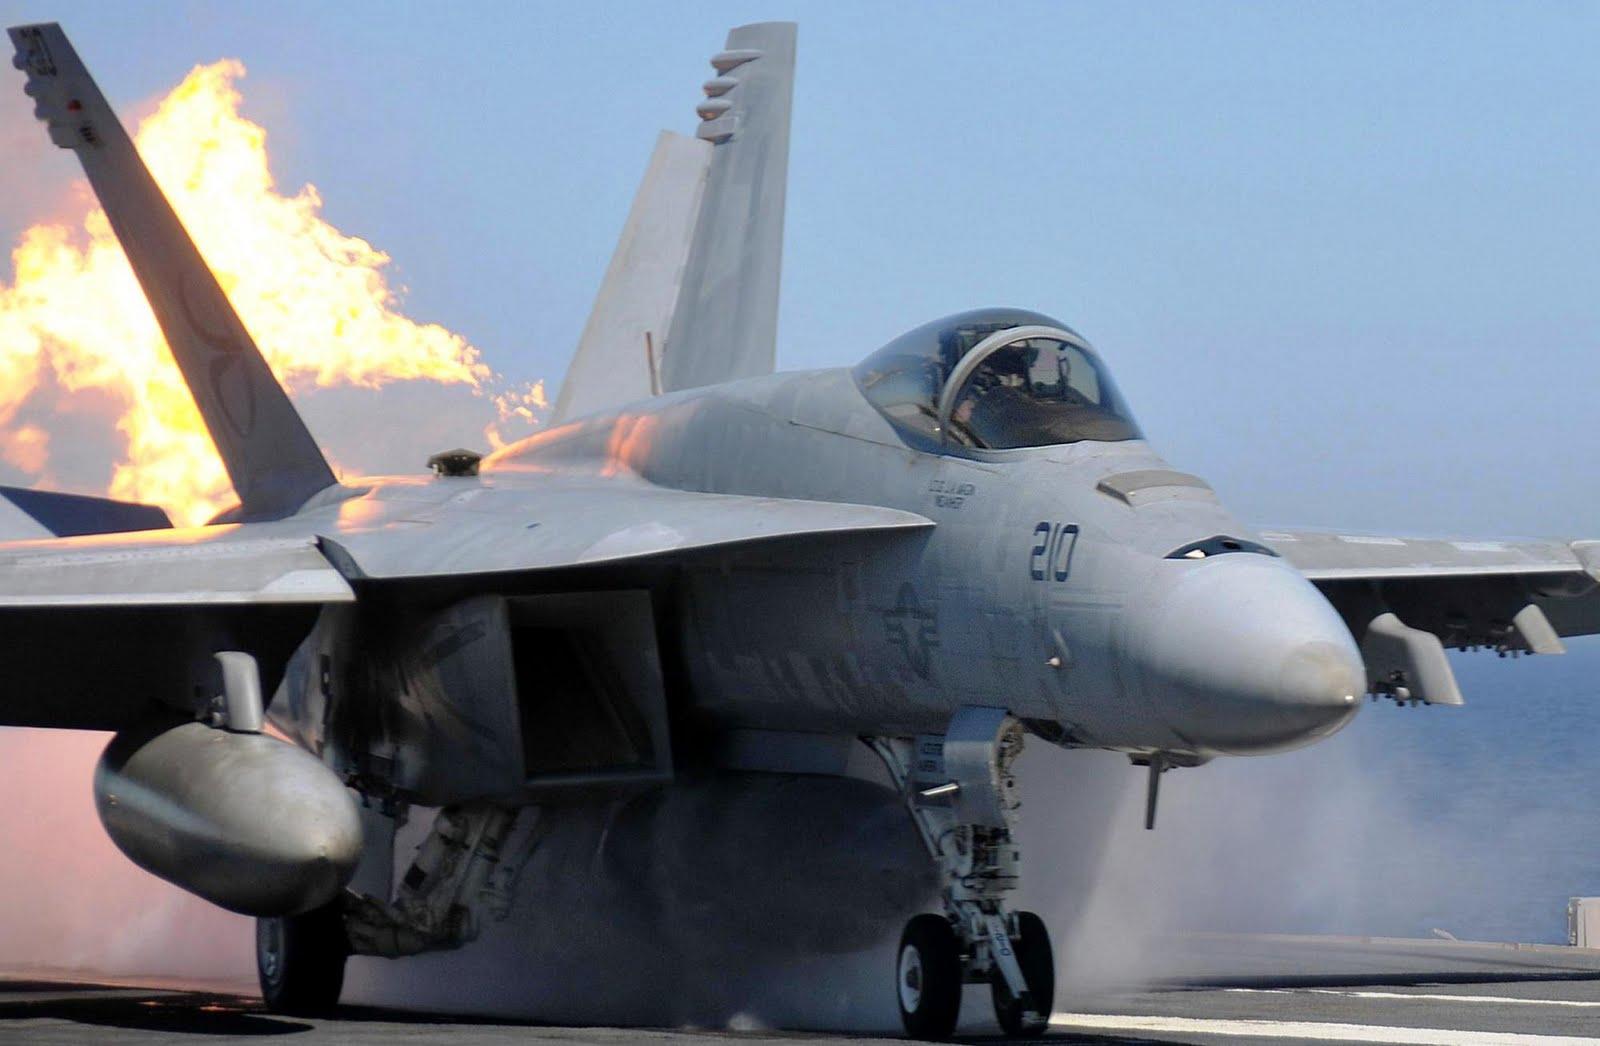 http://4.bp.blogspot.com/-LvI-Mbhmyps/ThwPNQ-dOnI/AAAAAAAAF5s/Al7XYVFfBQo/s1600/fa_18e_super_hornet_burning_takeoff_2398714_aircraft-wallpaper.jpg